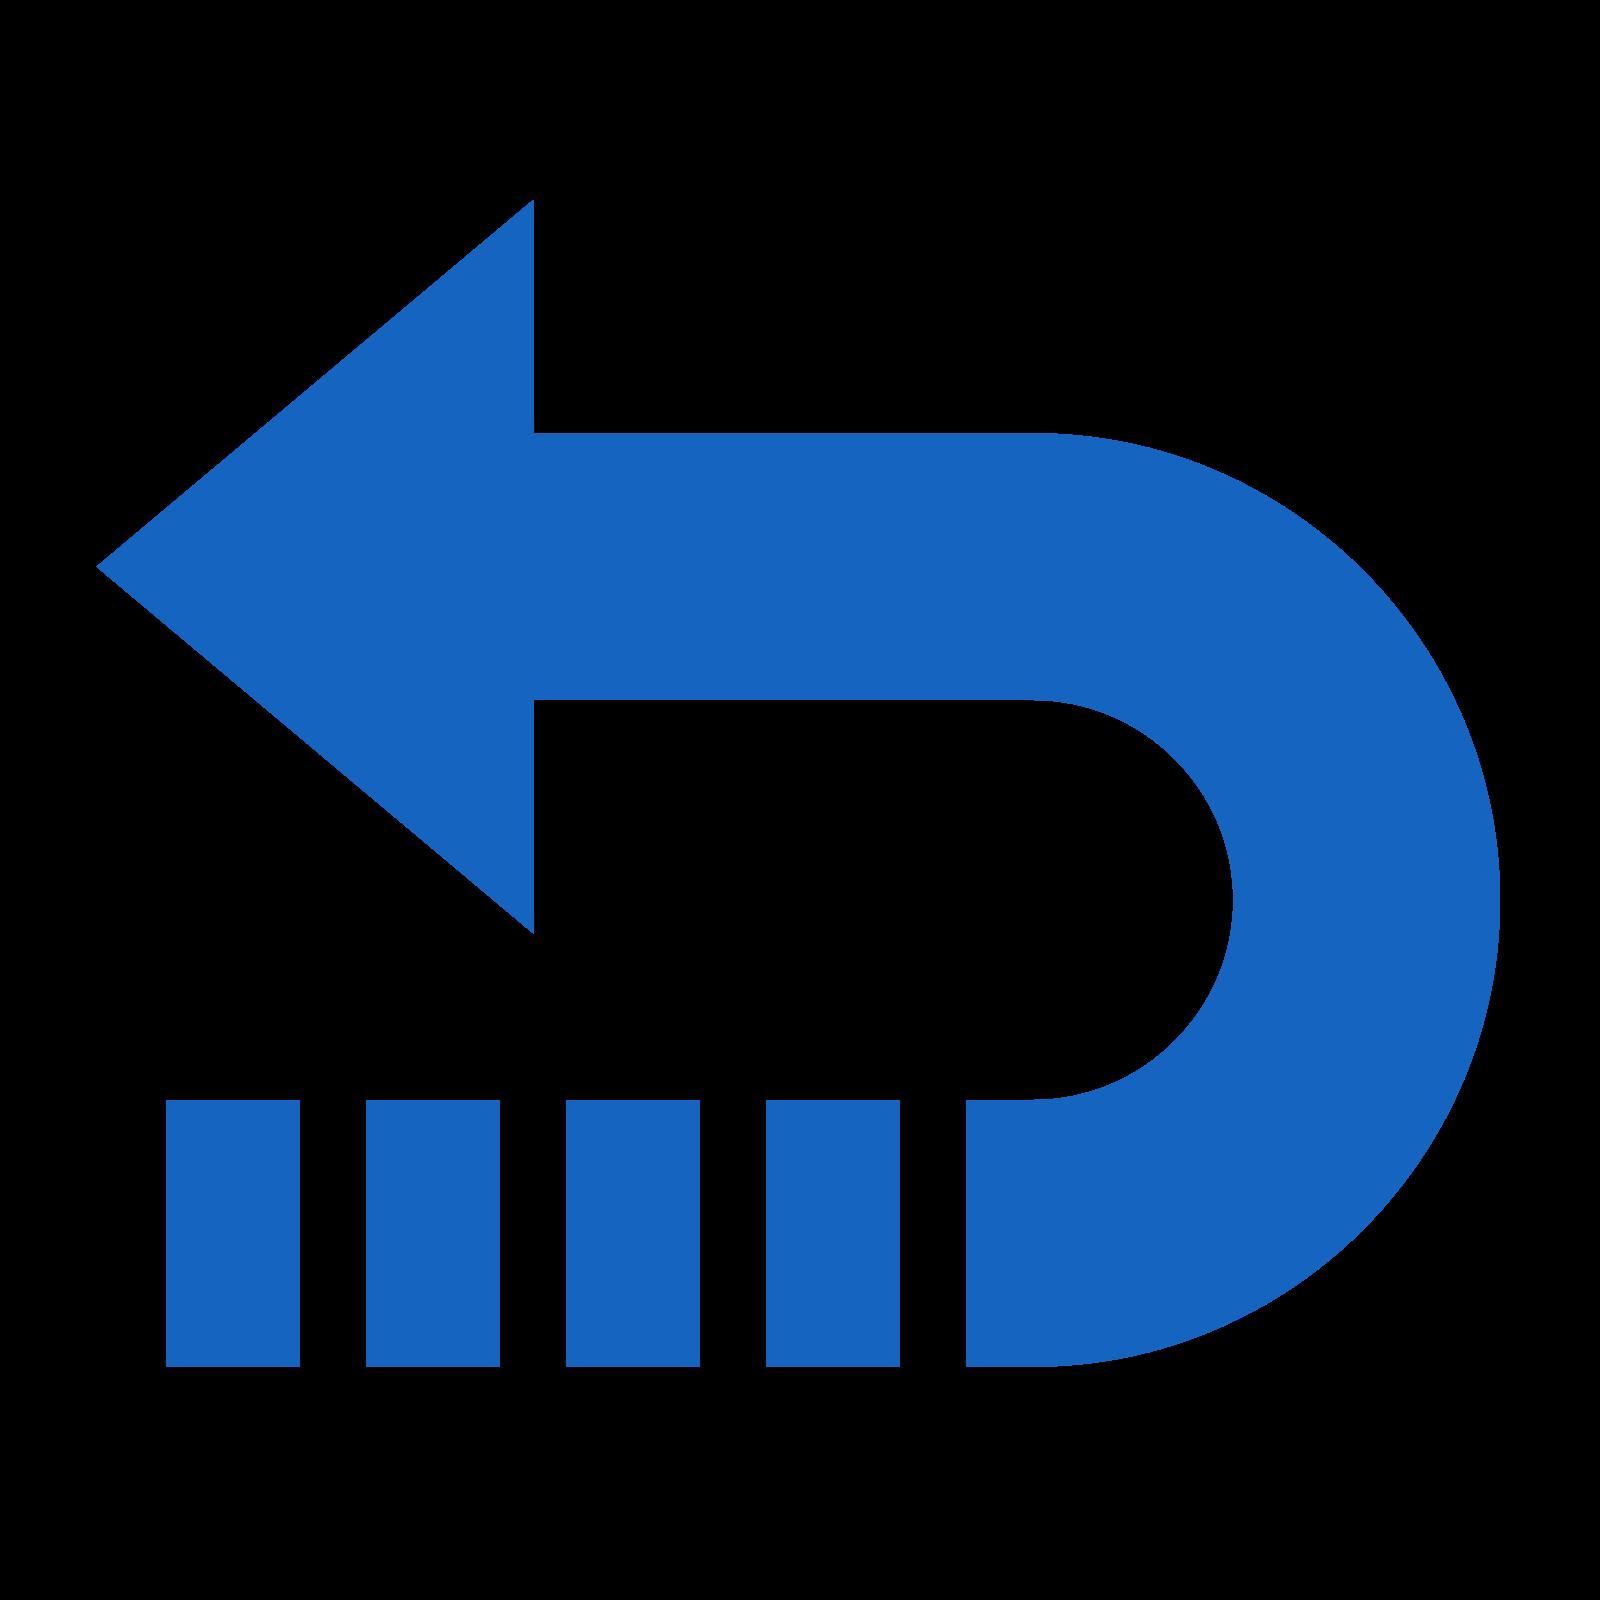 Return icon